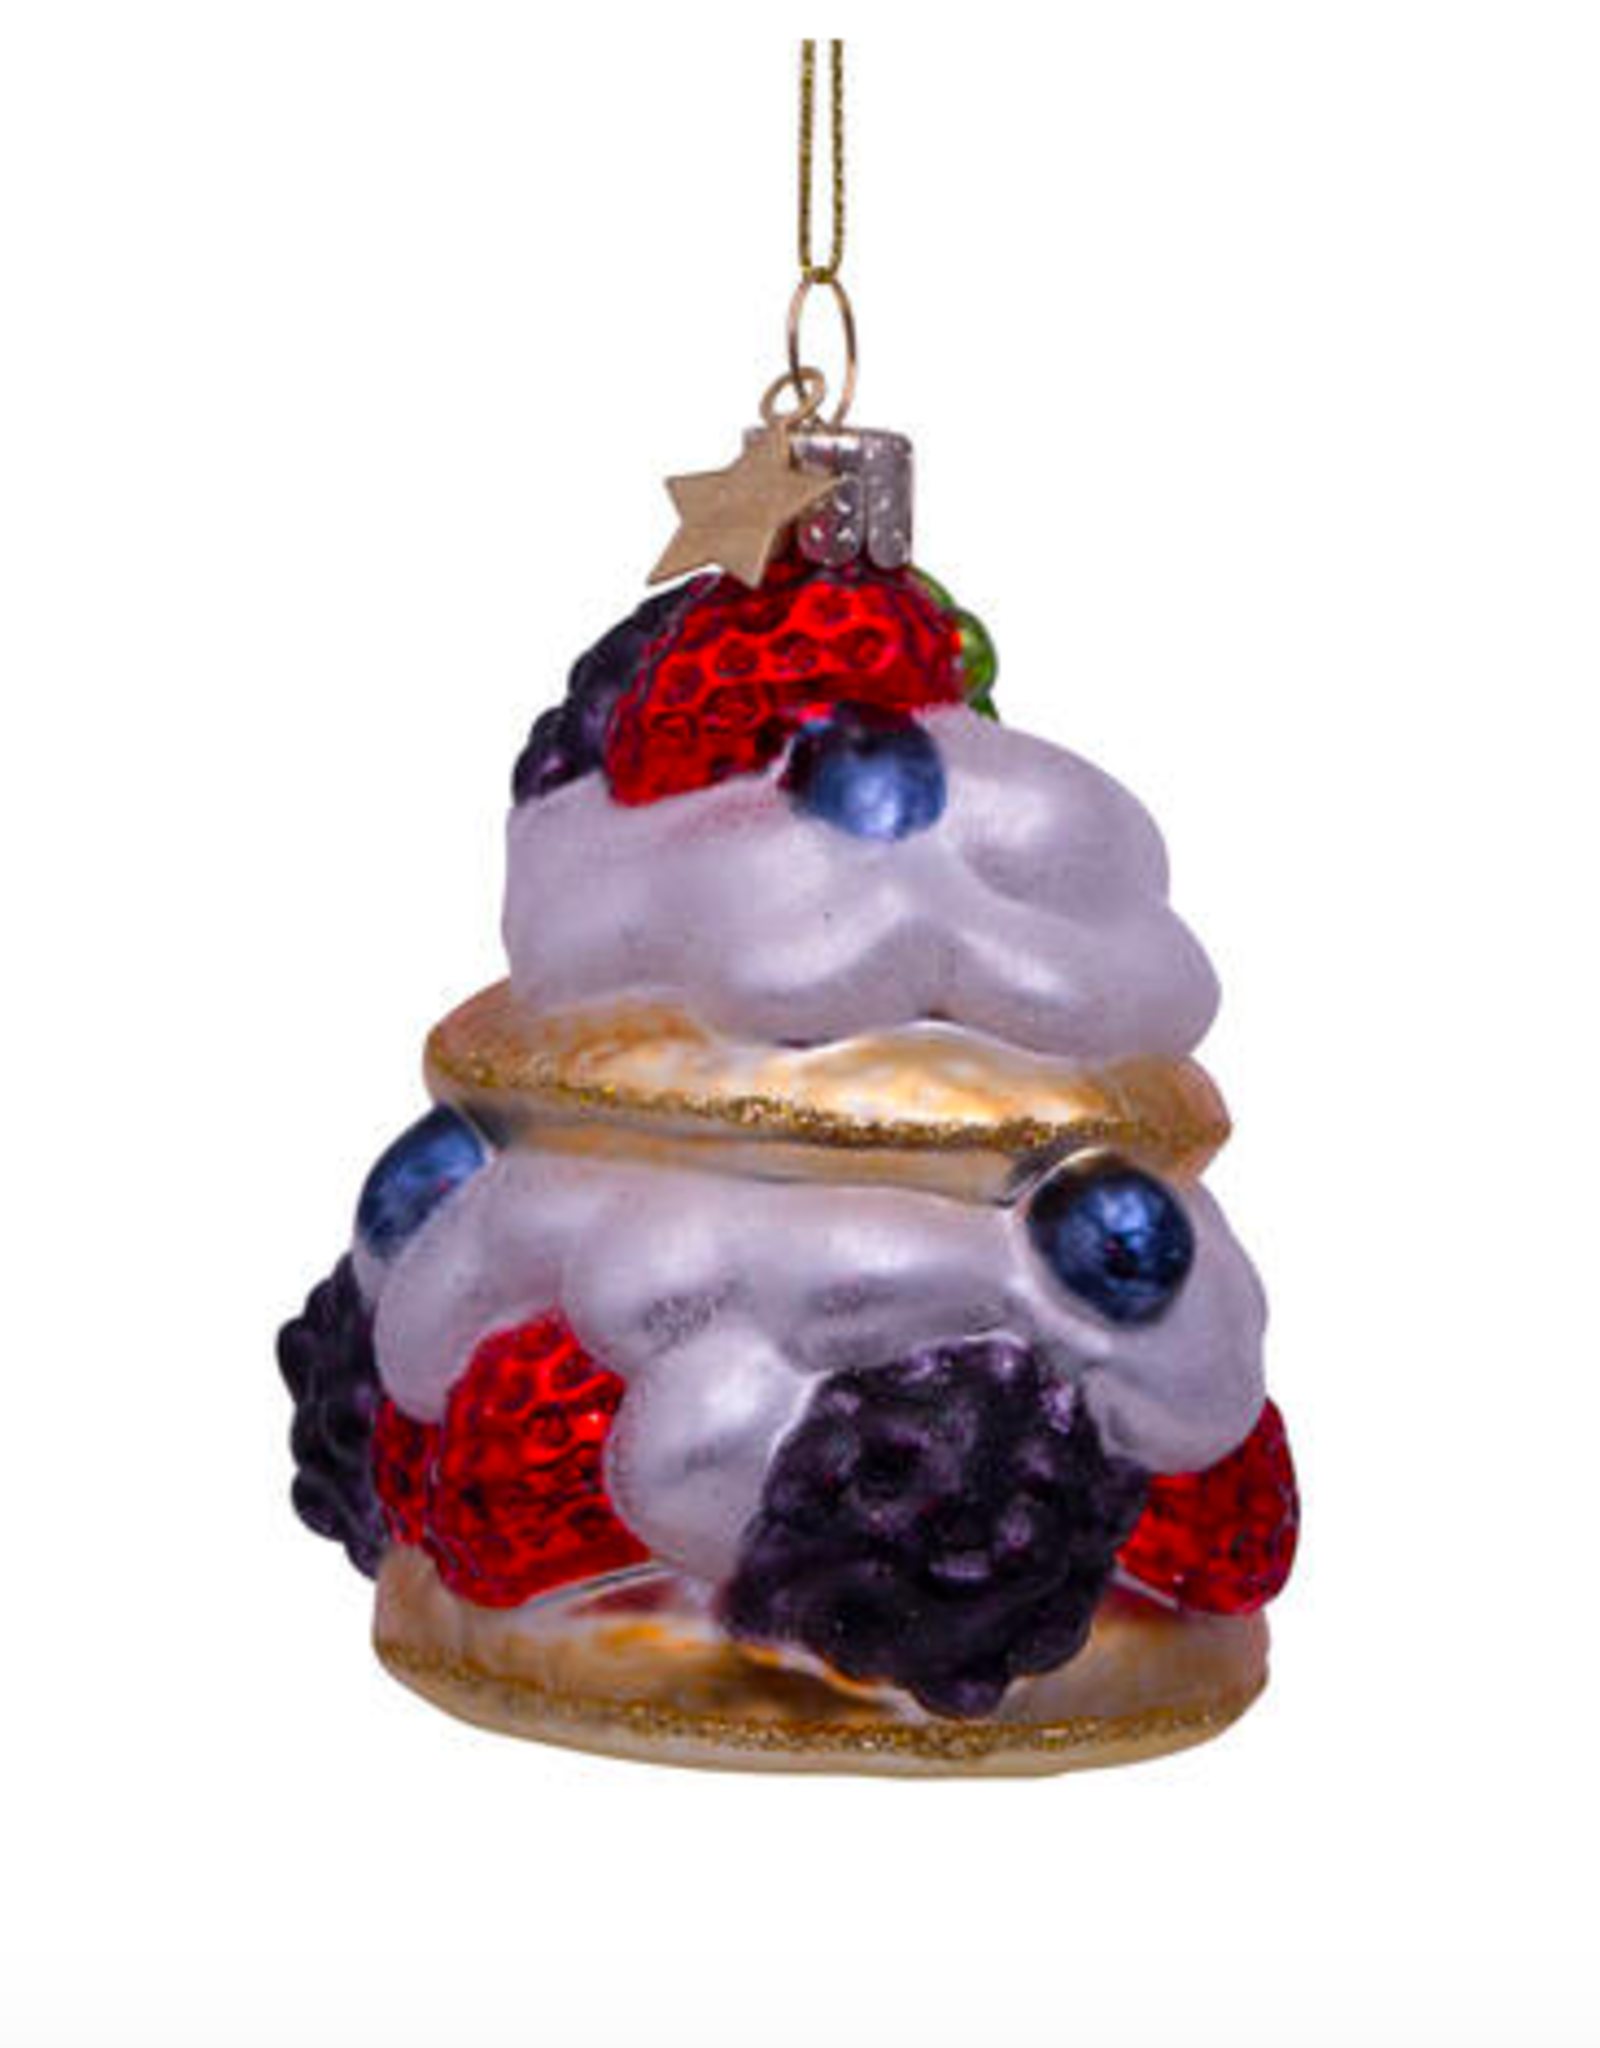 Vondels Cake cream christmas ornament